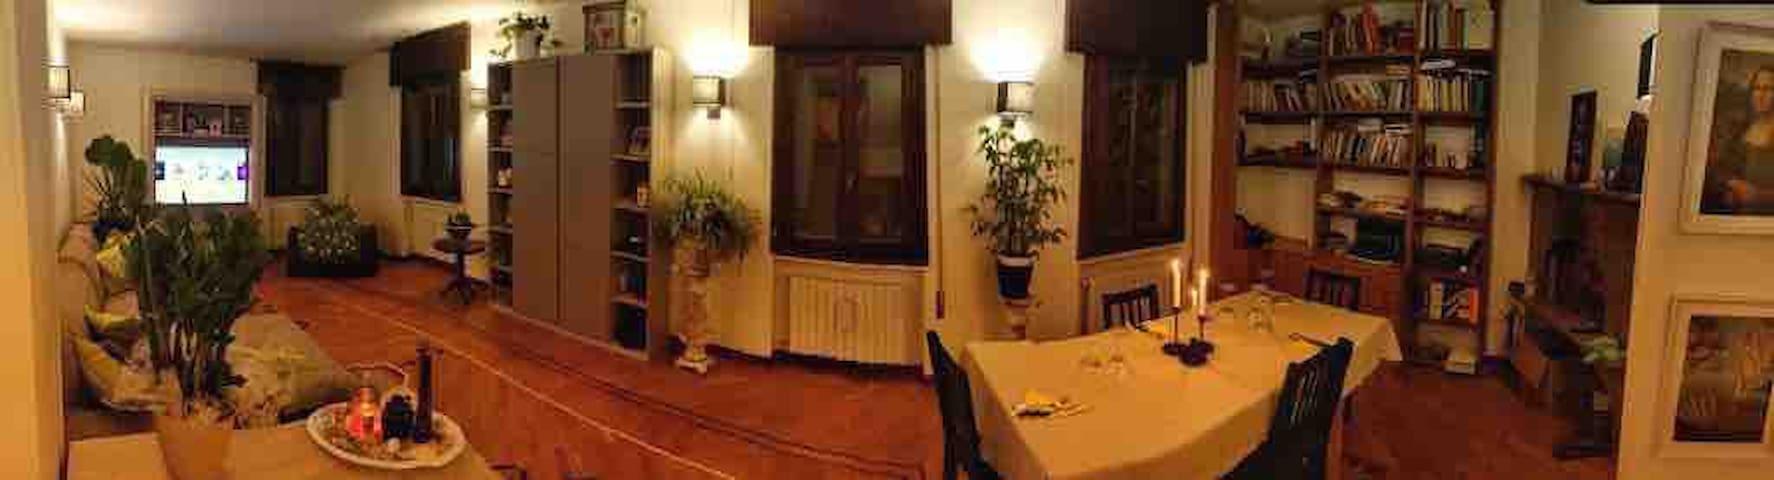 Bolzano Vicentino的民宿